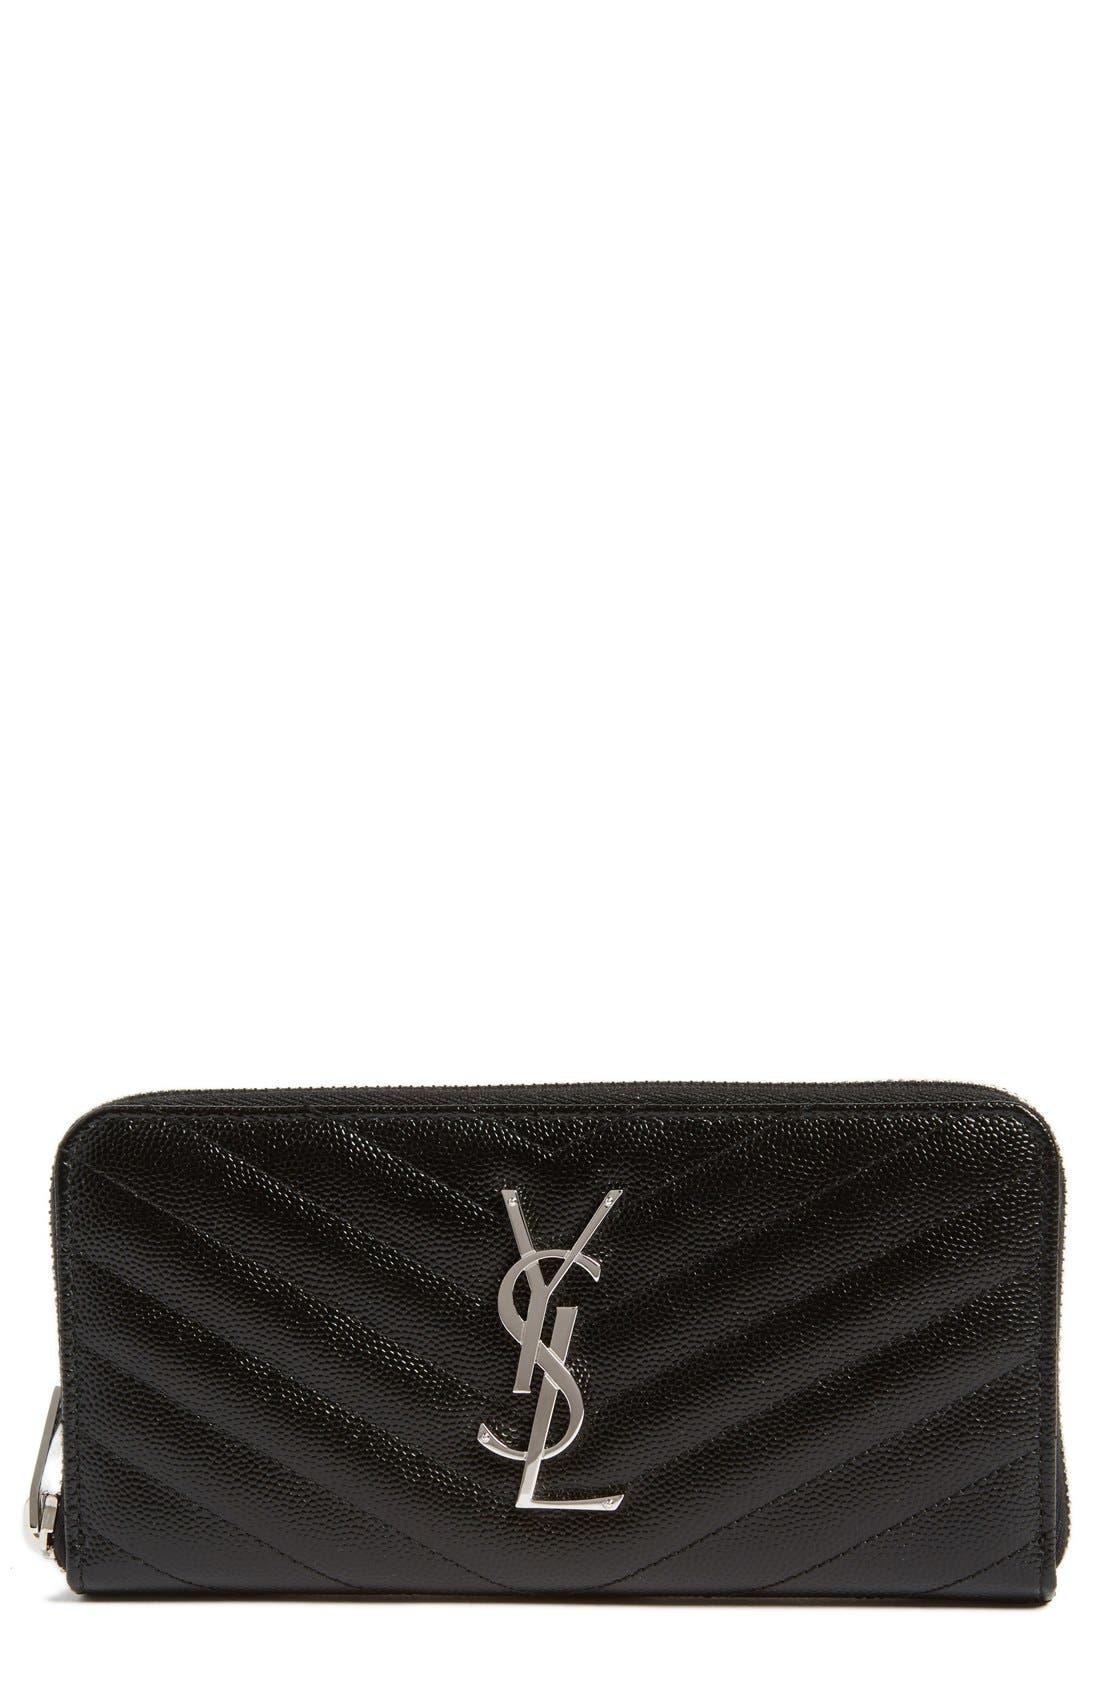 Main Image - Saint Laurent 'Monogram' Zip Around Quilted Calfskin Leather Wallet